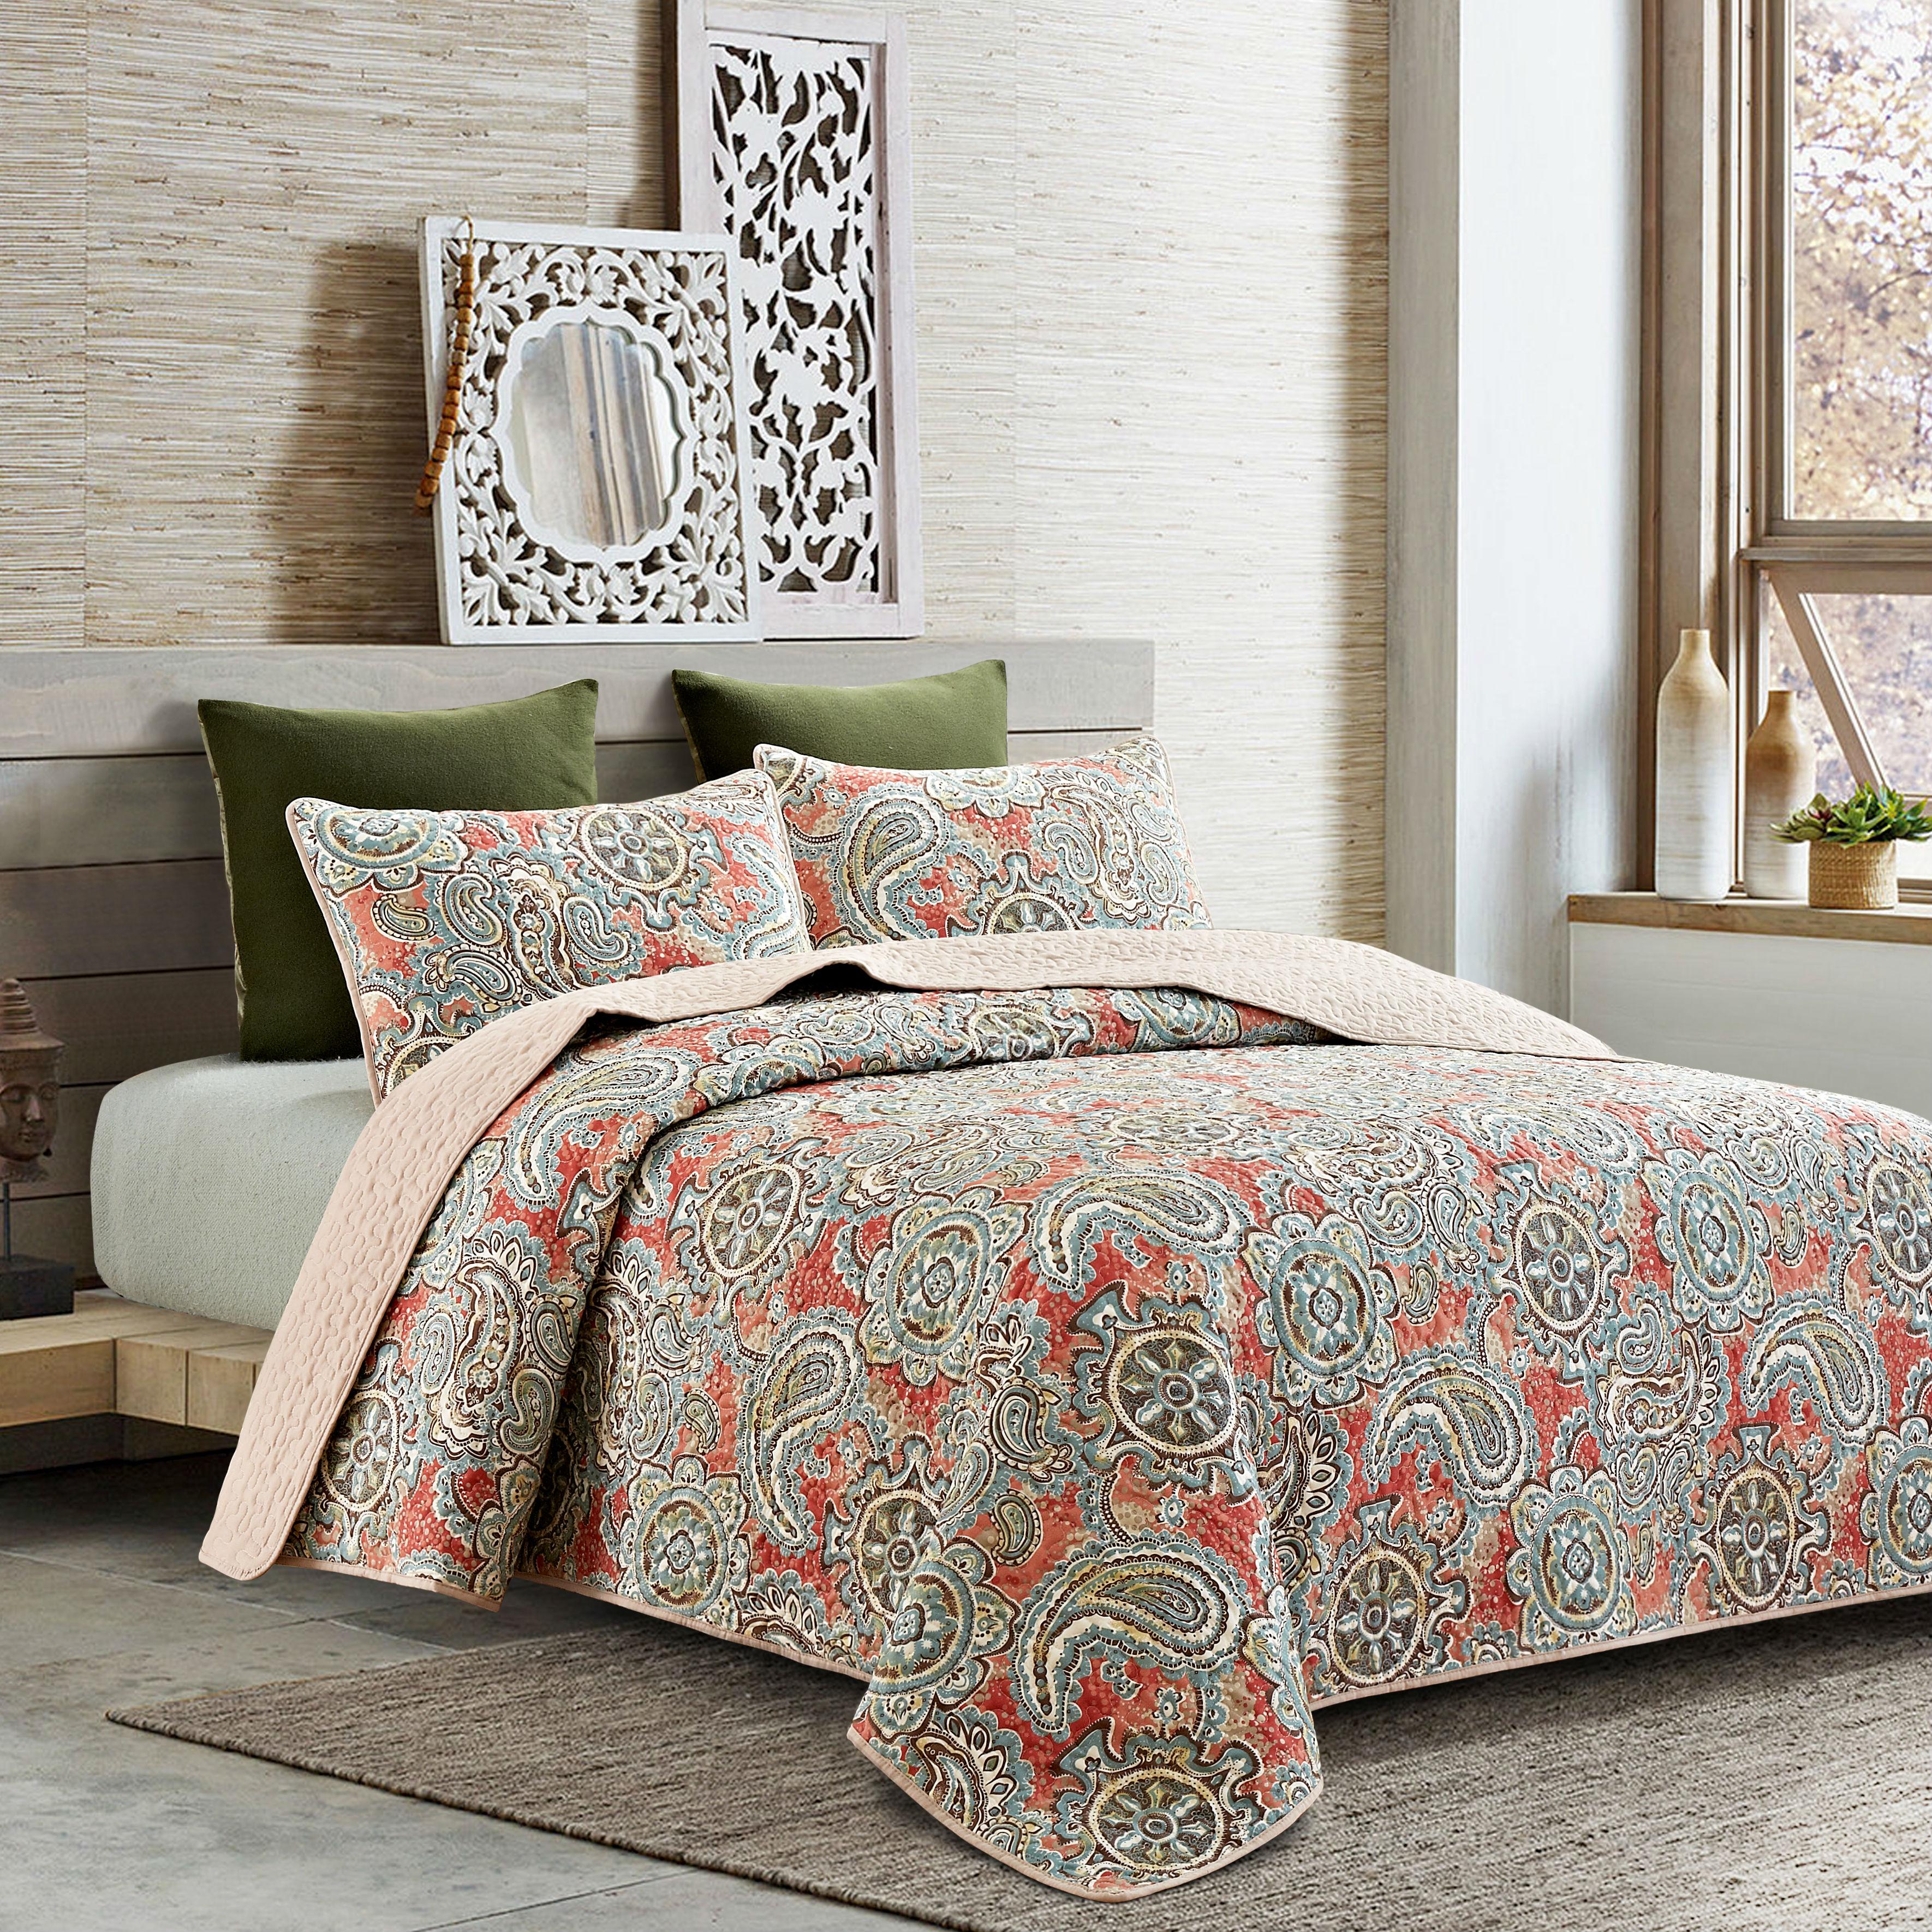 pinterest asha pin home imports sham pier quilts quilt paisley